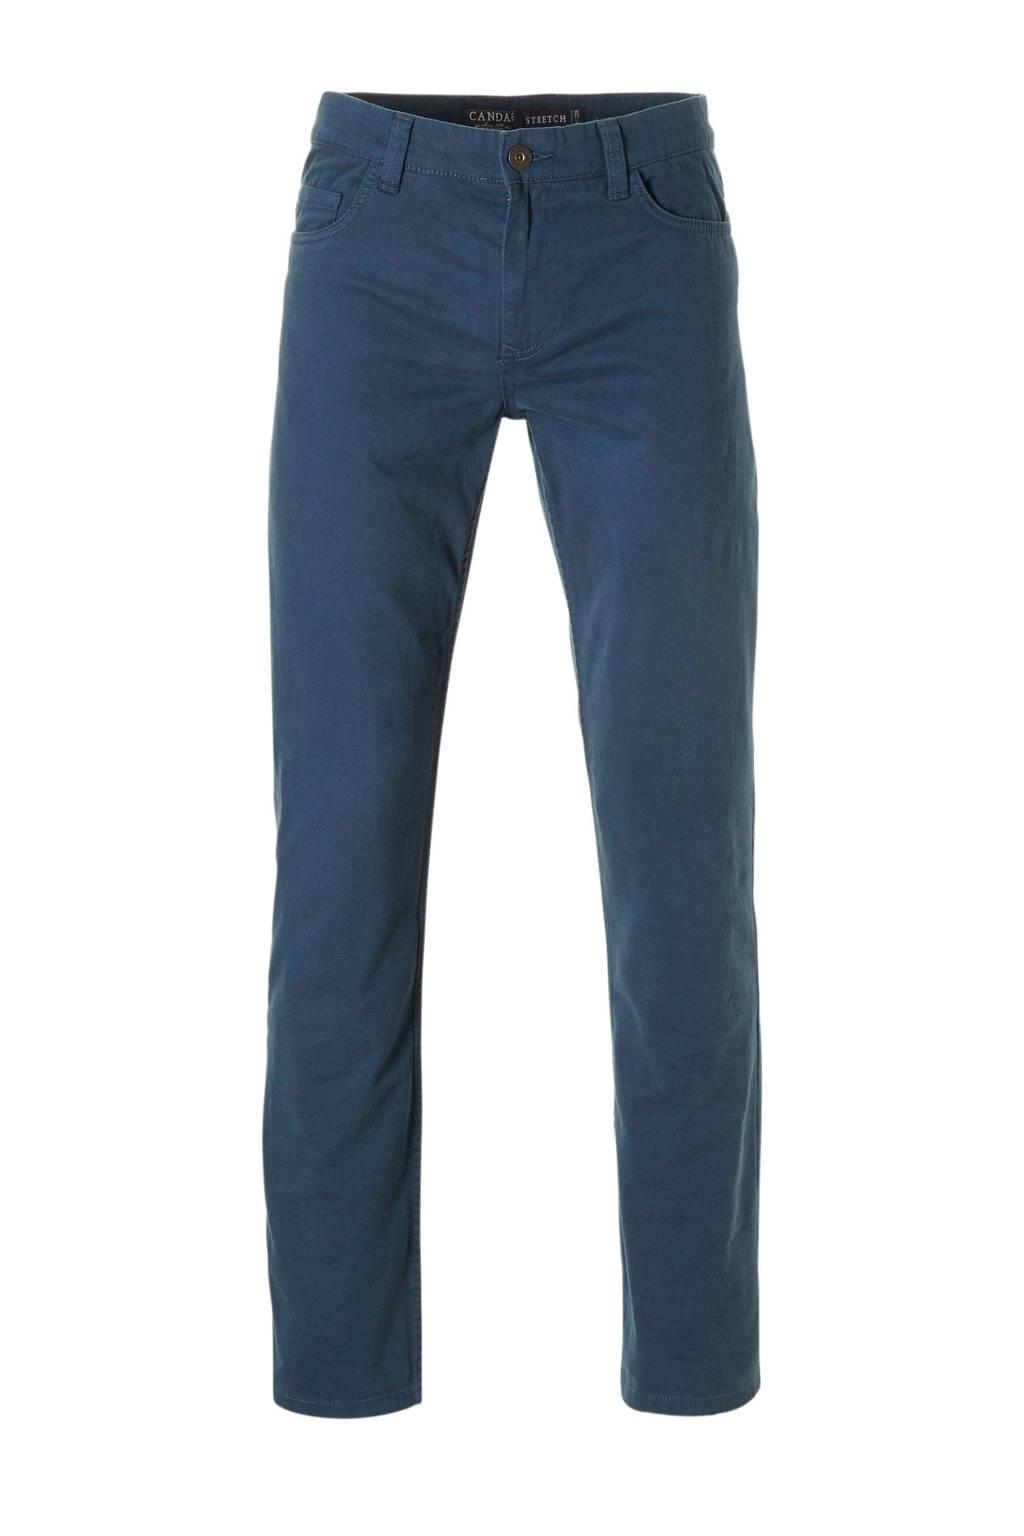 C&A Canda regular fit broek blauw, Blauw